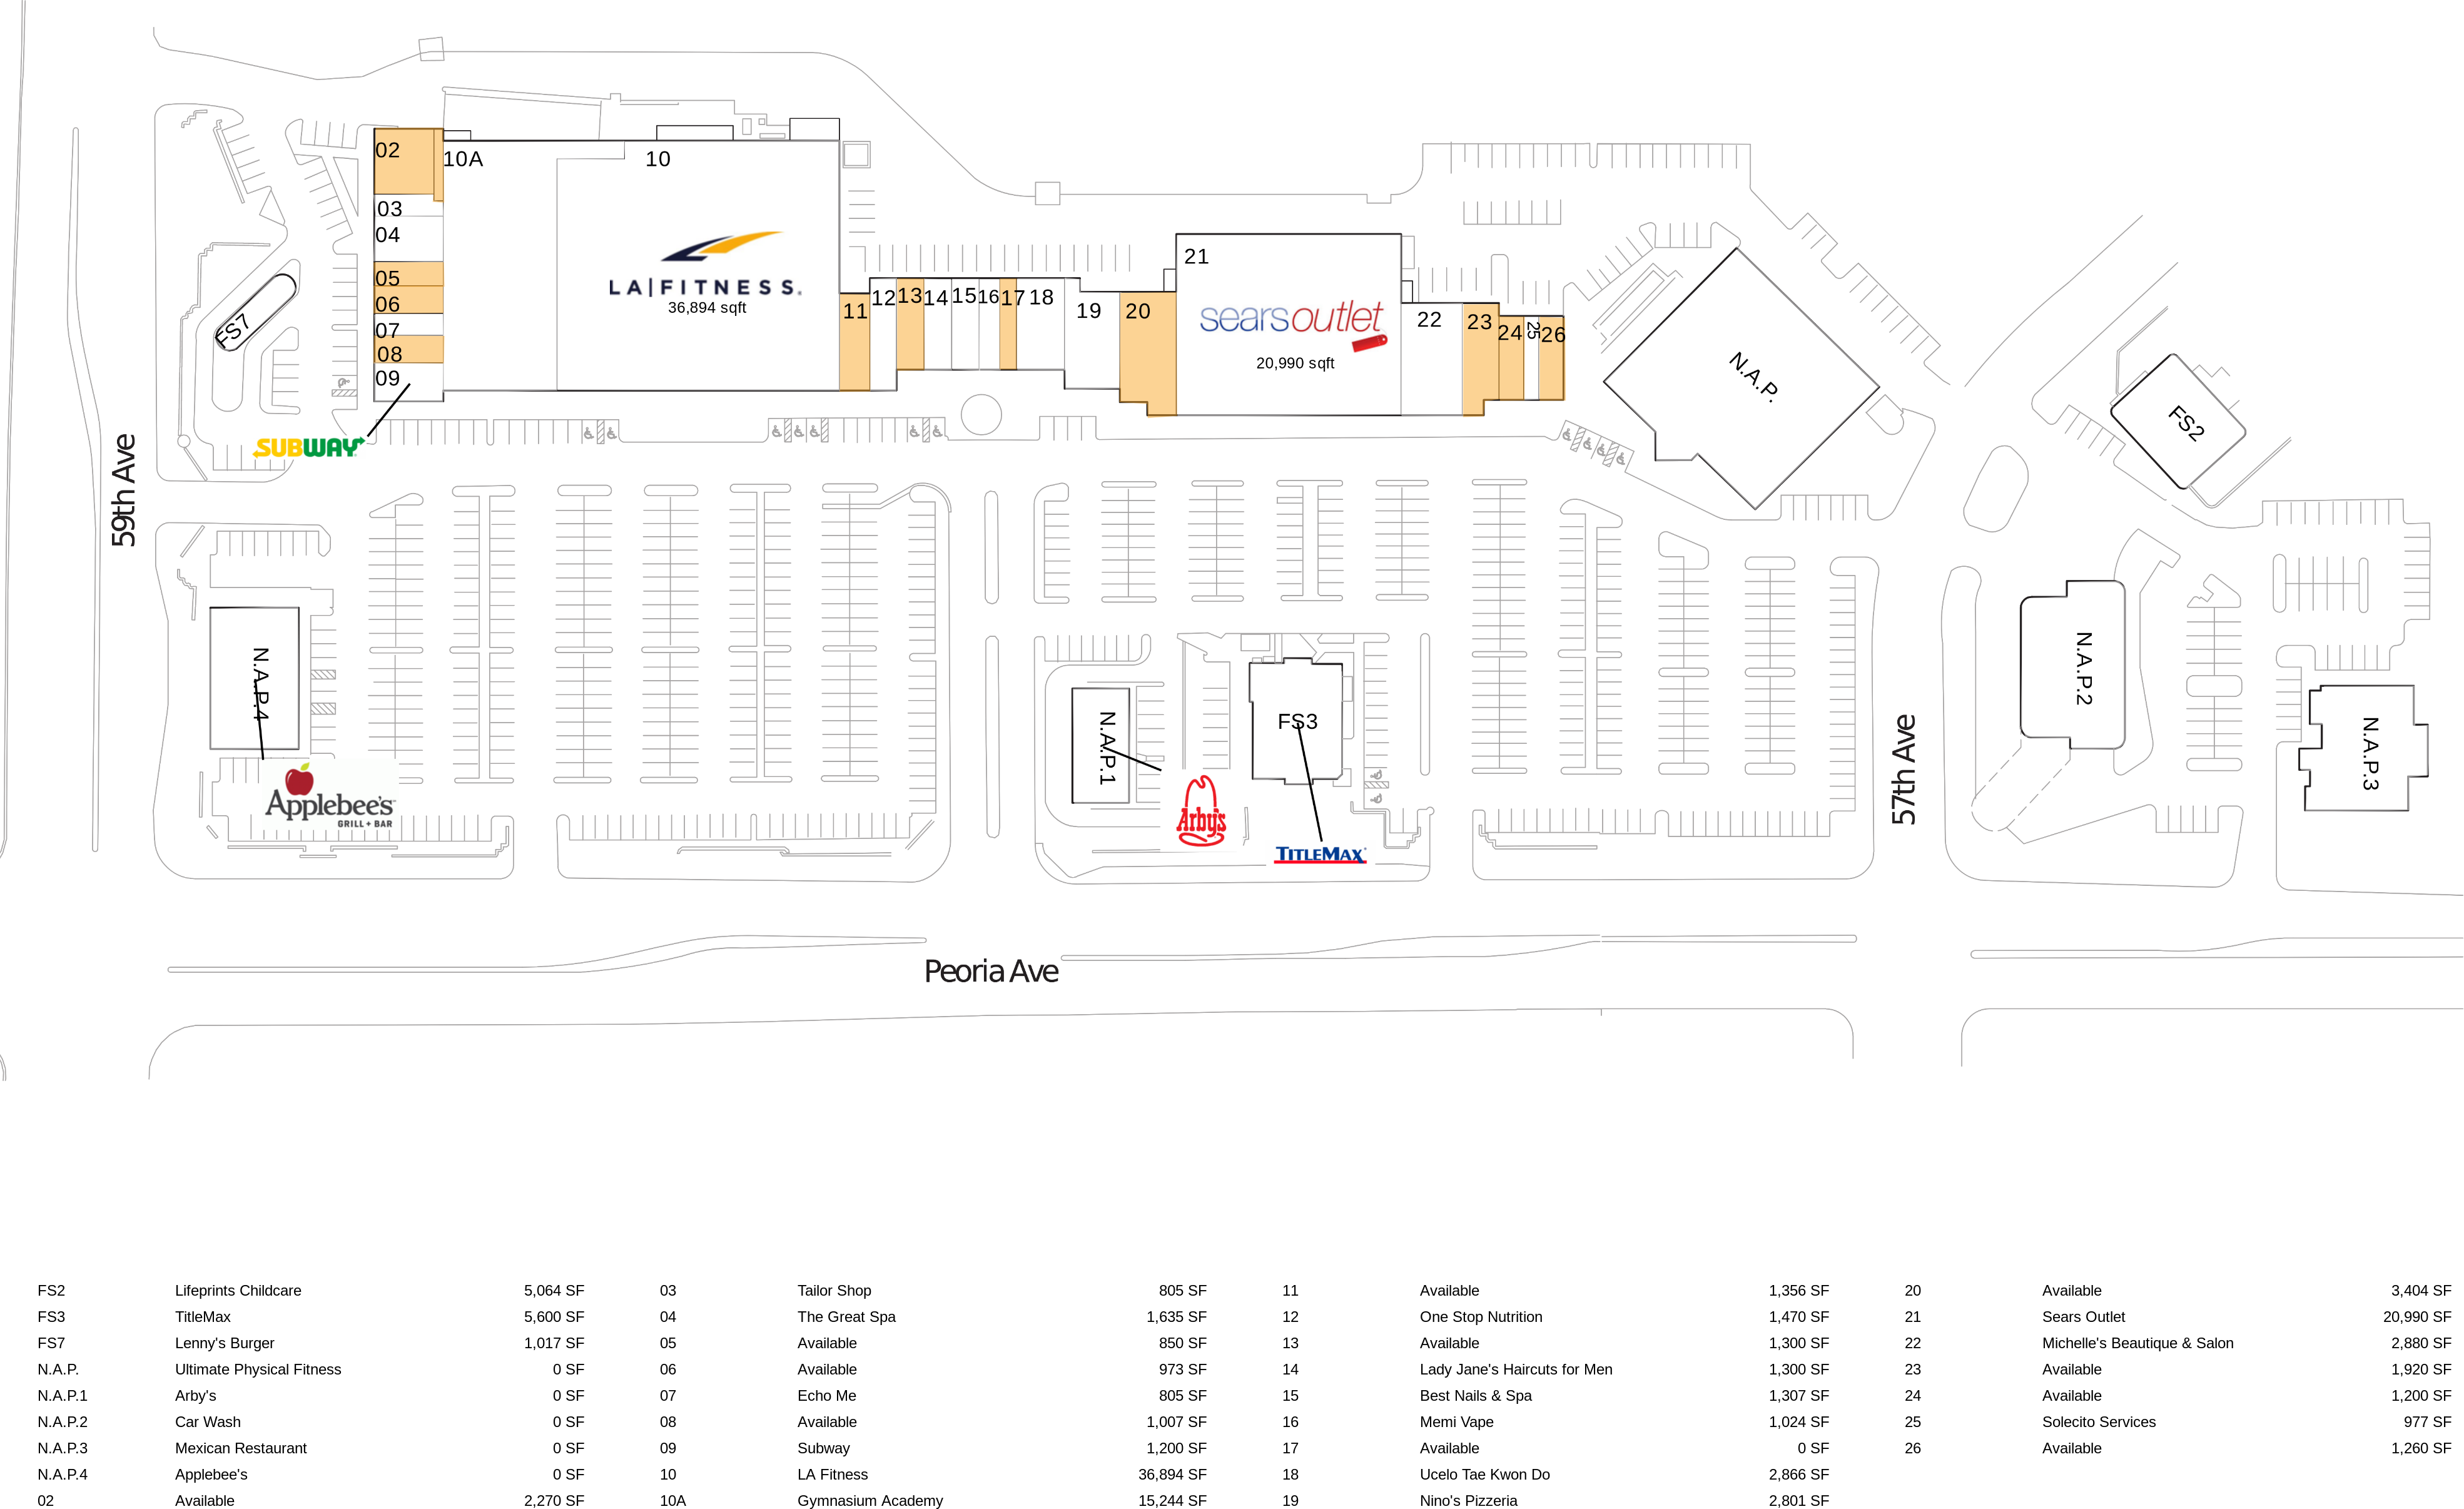 Glendale Galleria Map | World Map 07